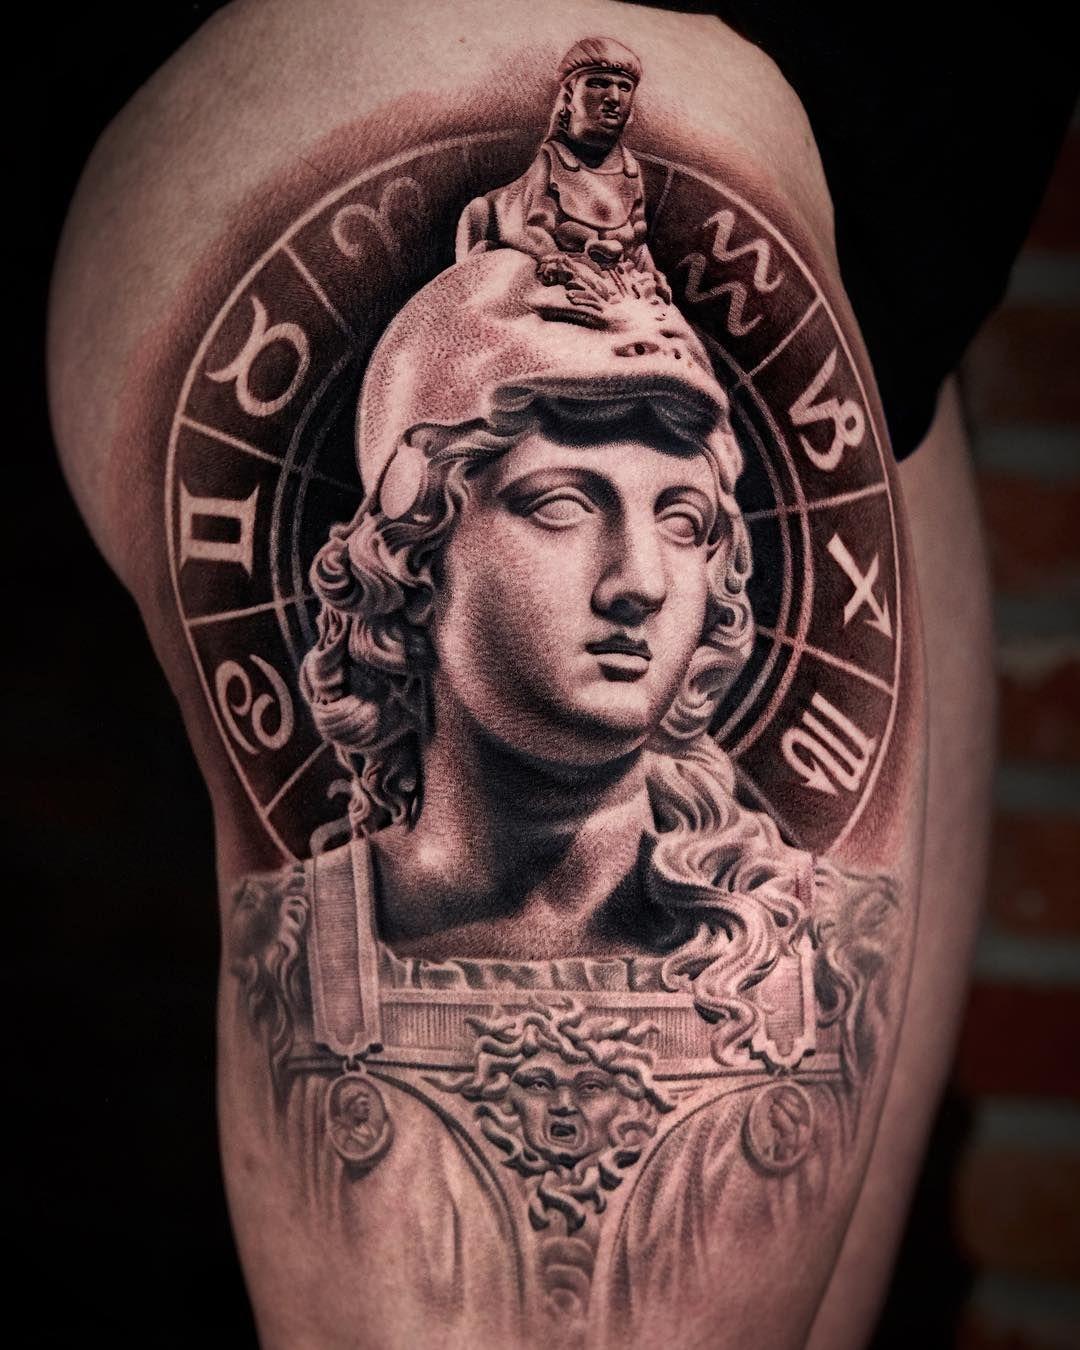 46+ Astonishing Greek statue tattoo artist image ideas